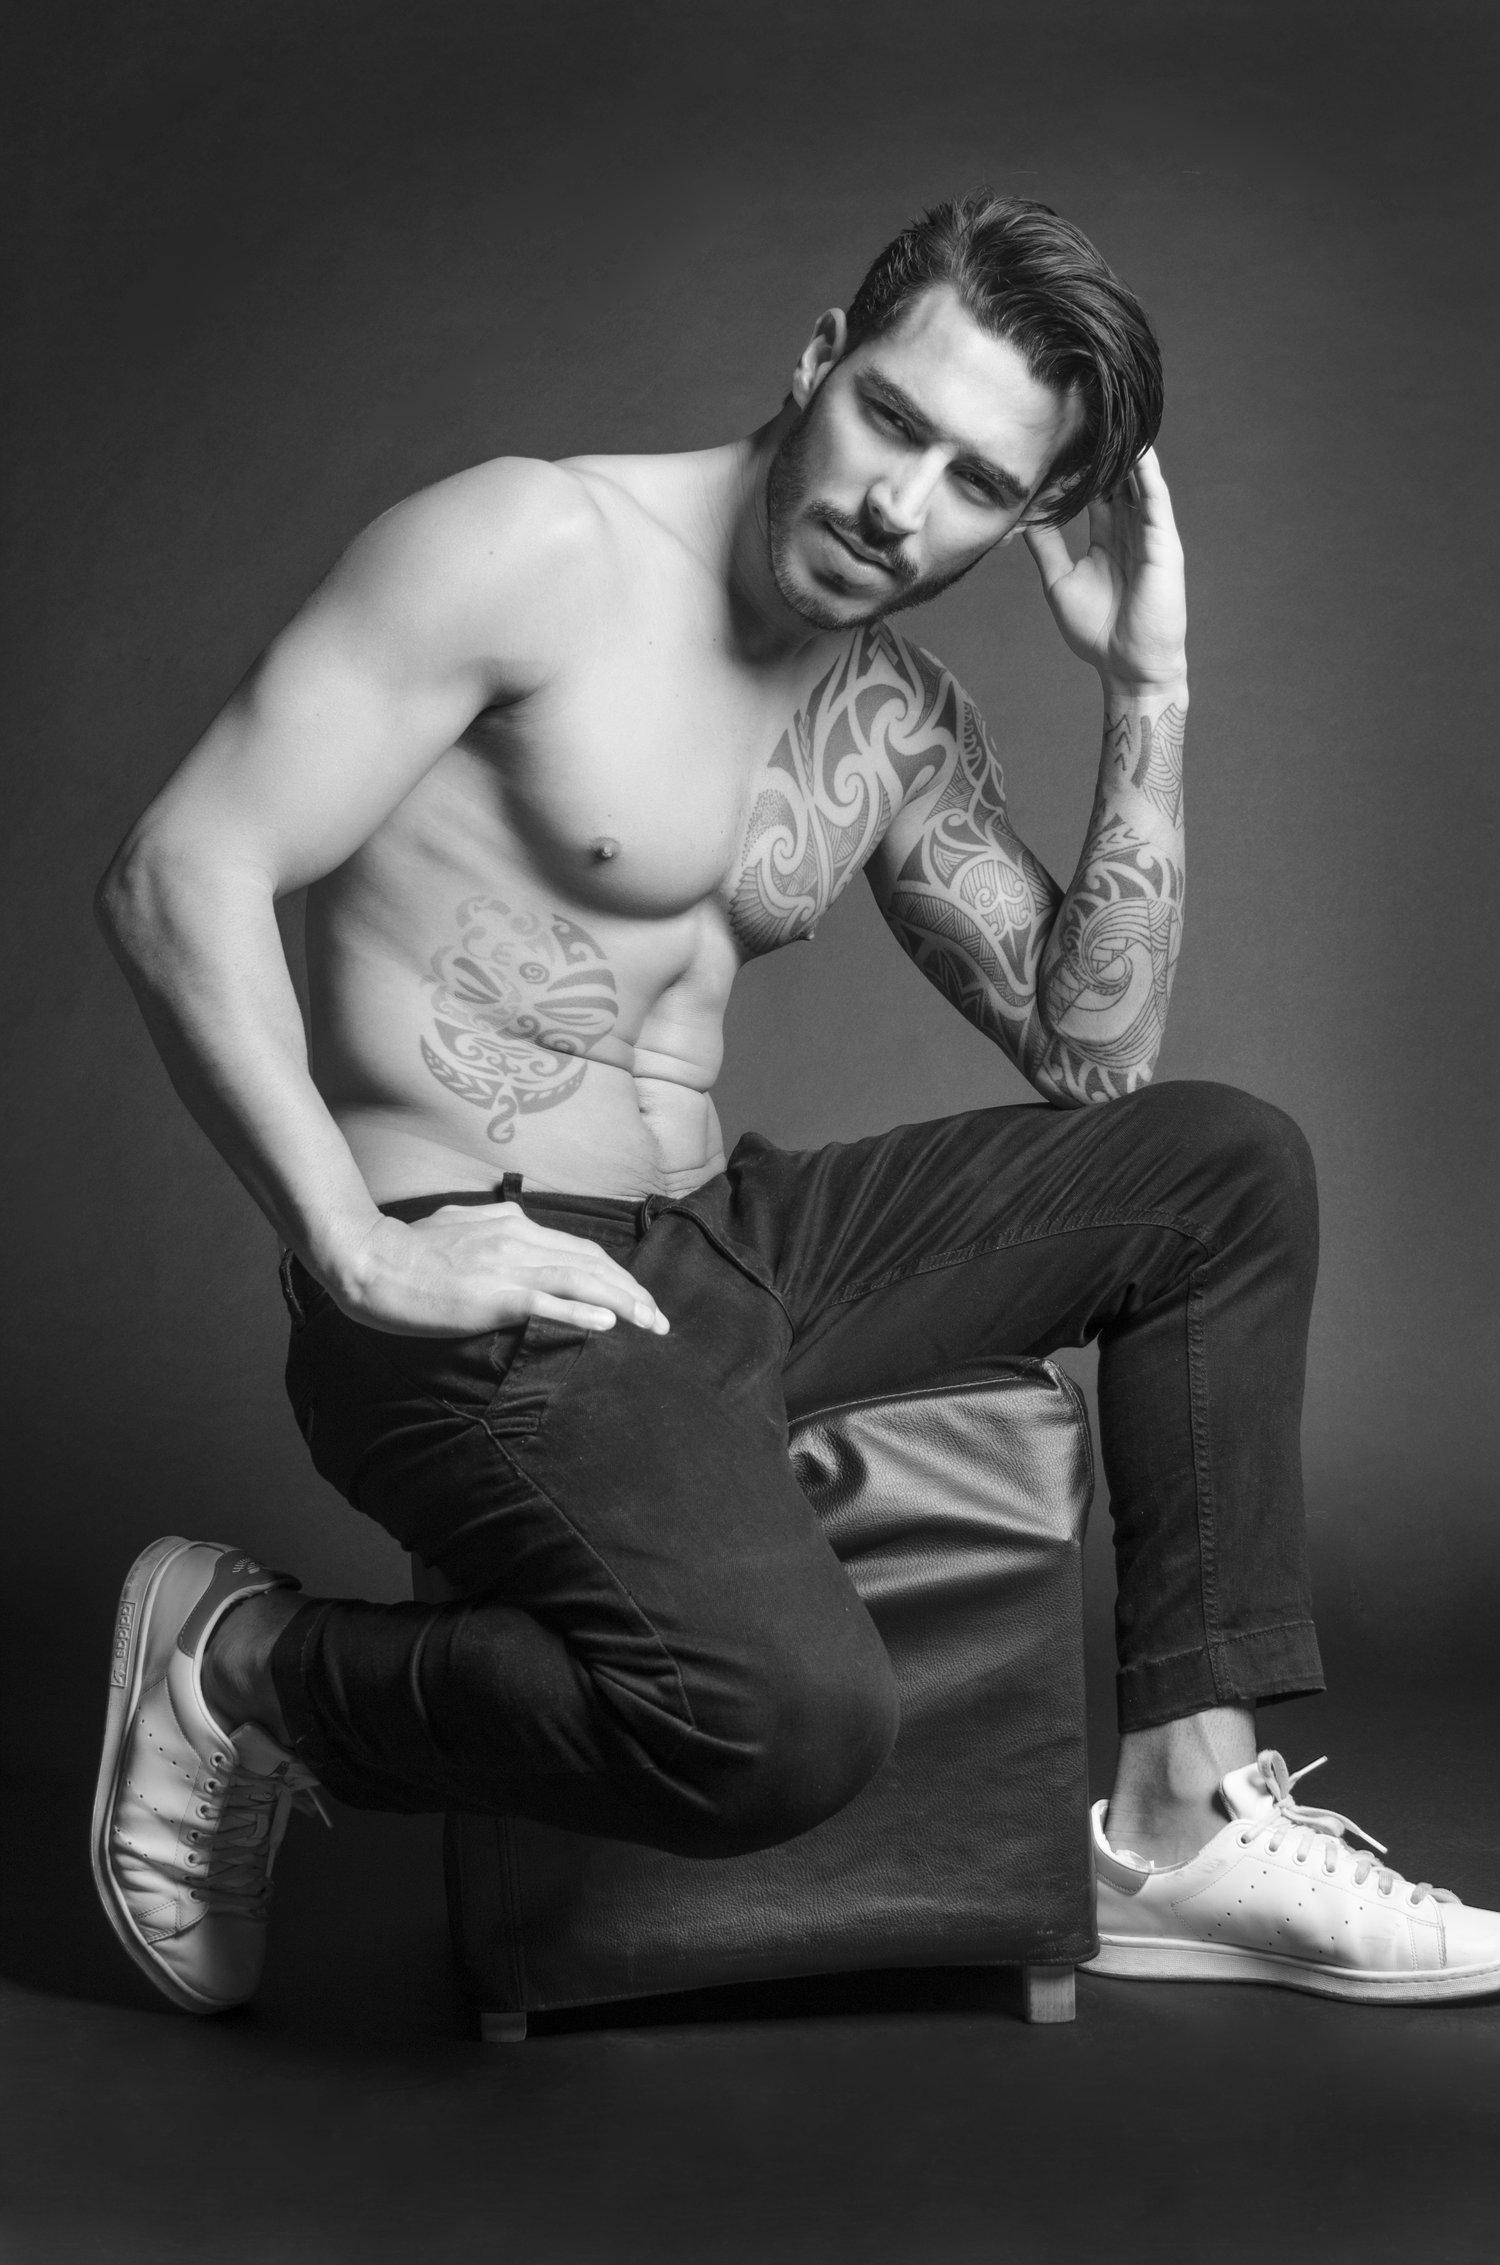 Adon Exclusive: Model Paulo Philippe By Margarida Cautela